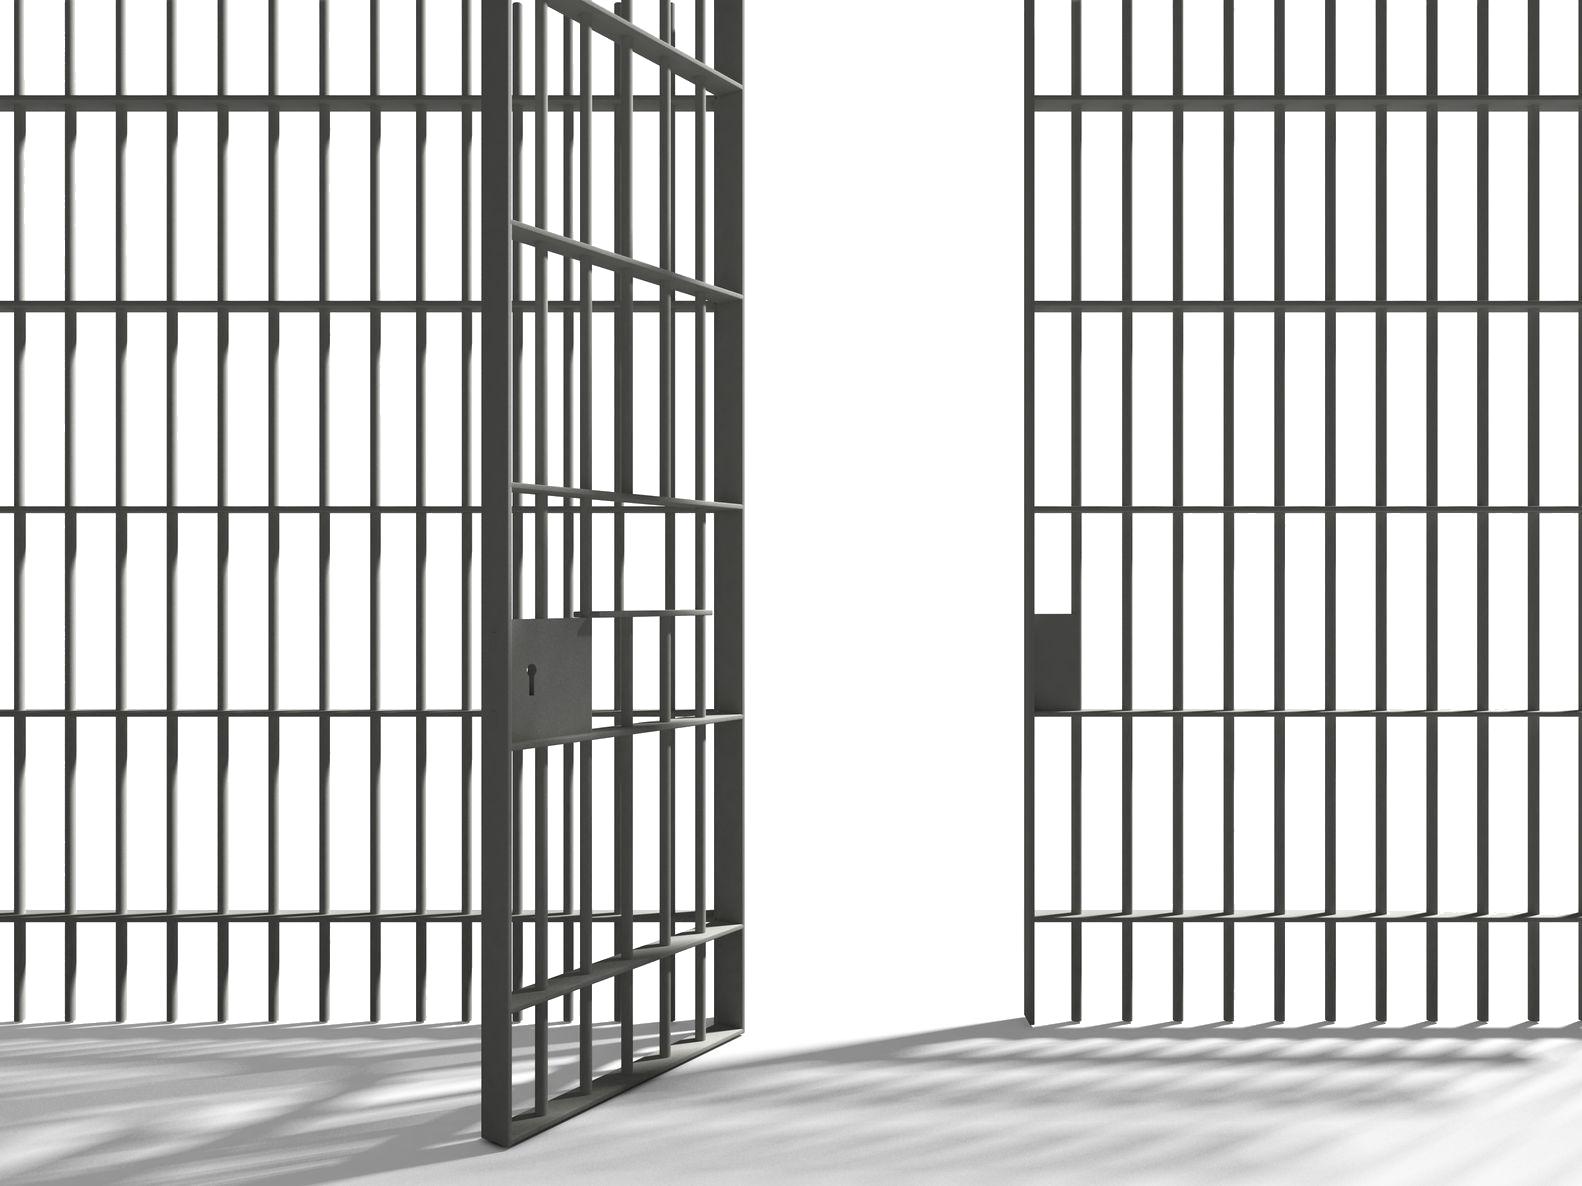 Jail Prison Png Image Cenario Para Videos Diamantes Azuis Casa Anime